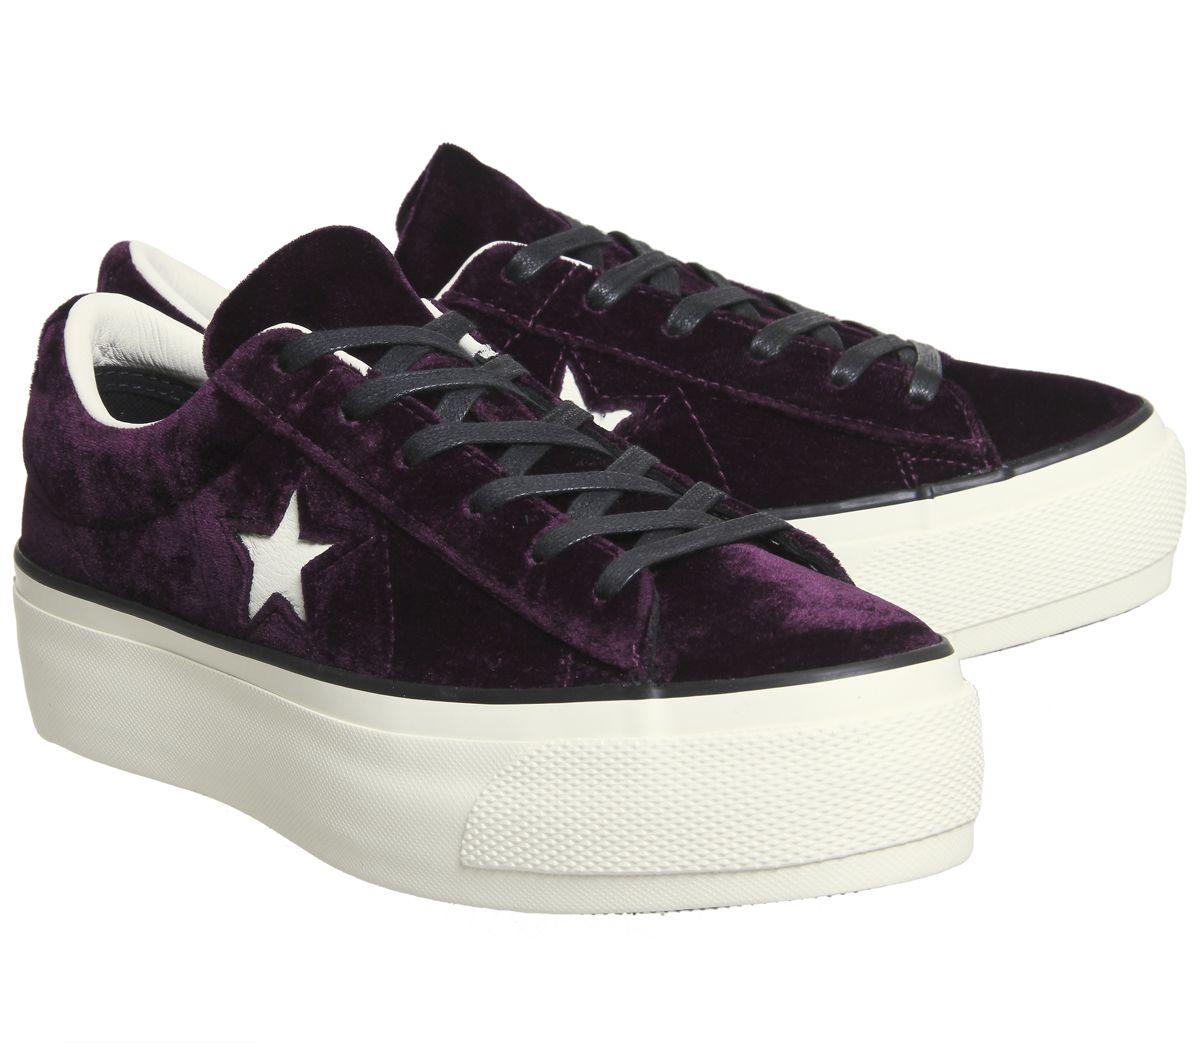 Womens-Converse-One-Star-Platforms-Dark-Sangria-Egret-Velvet-Trainers-Shoes thumbnail 7